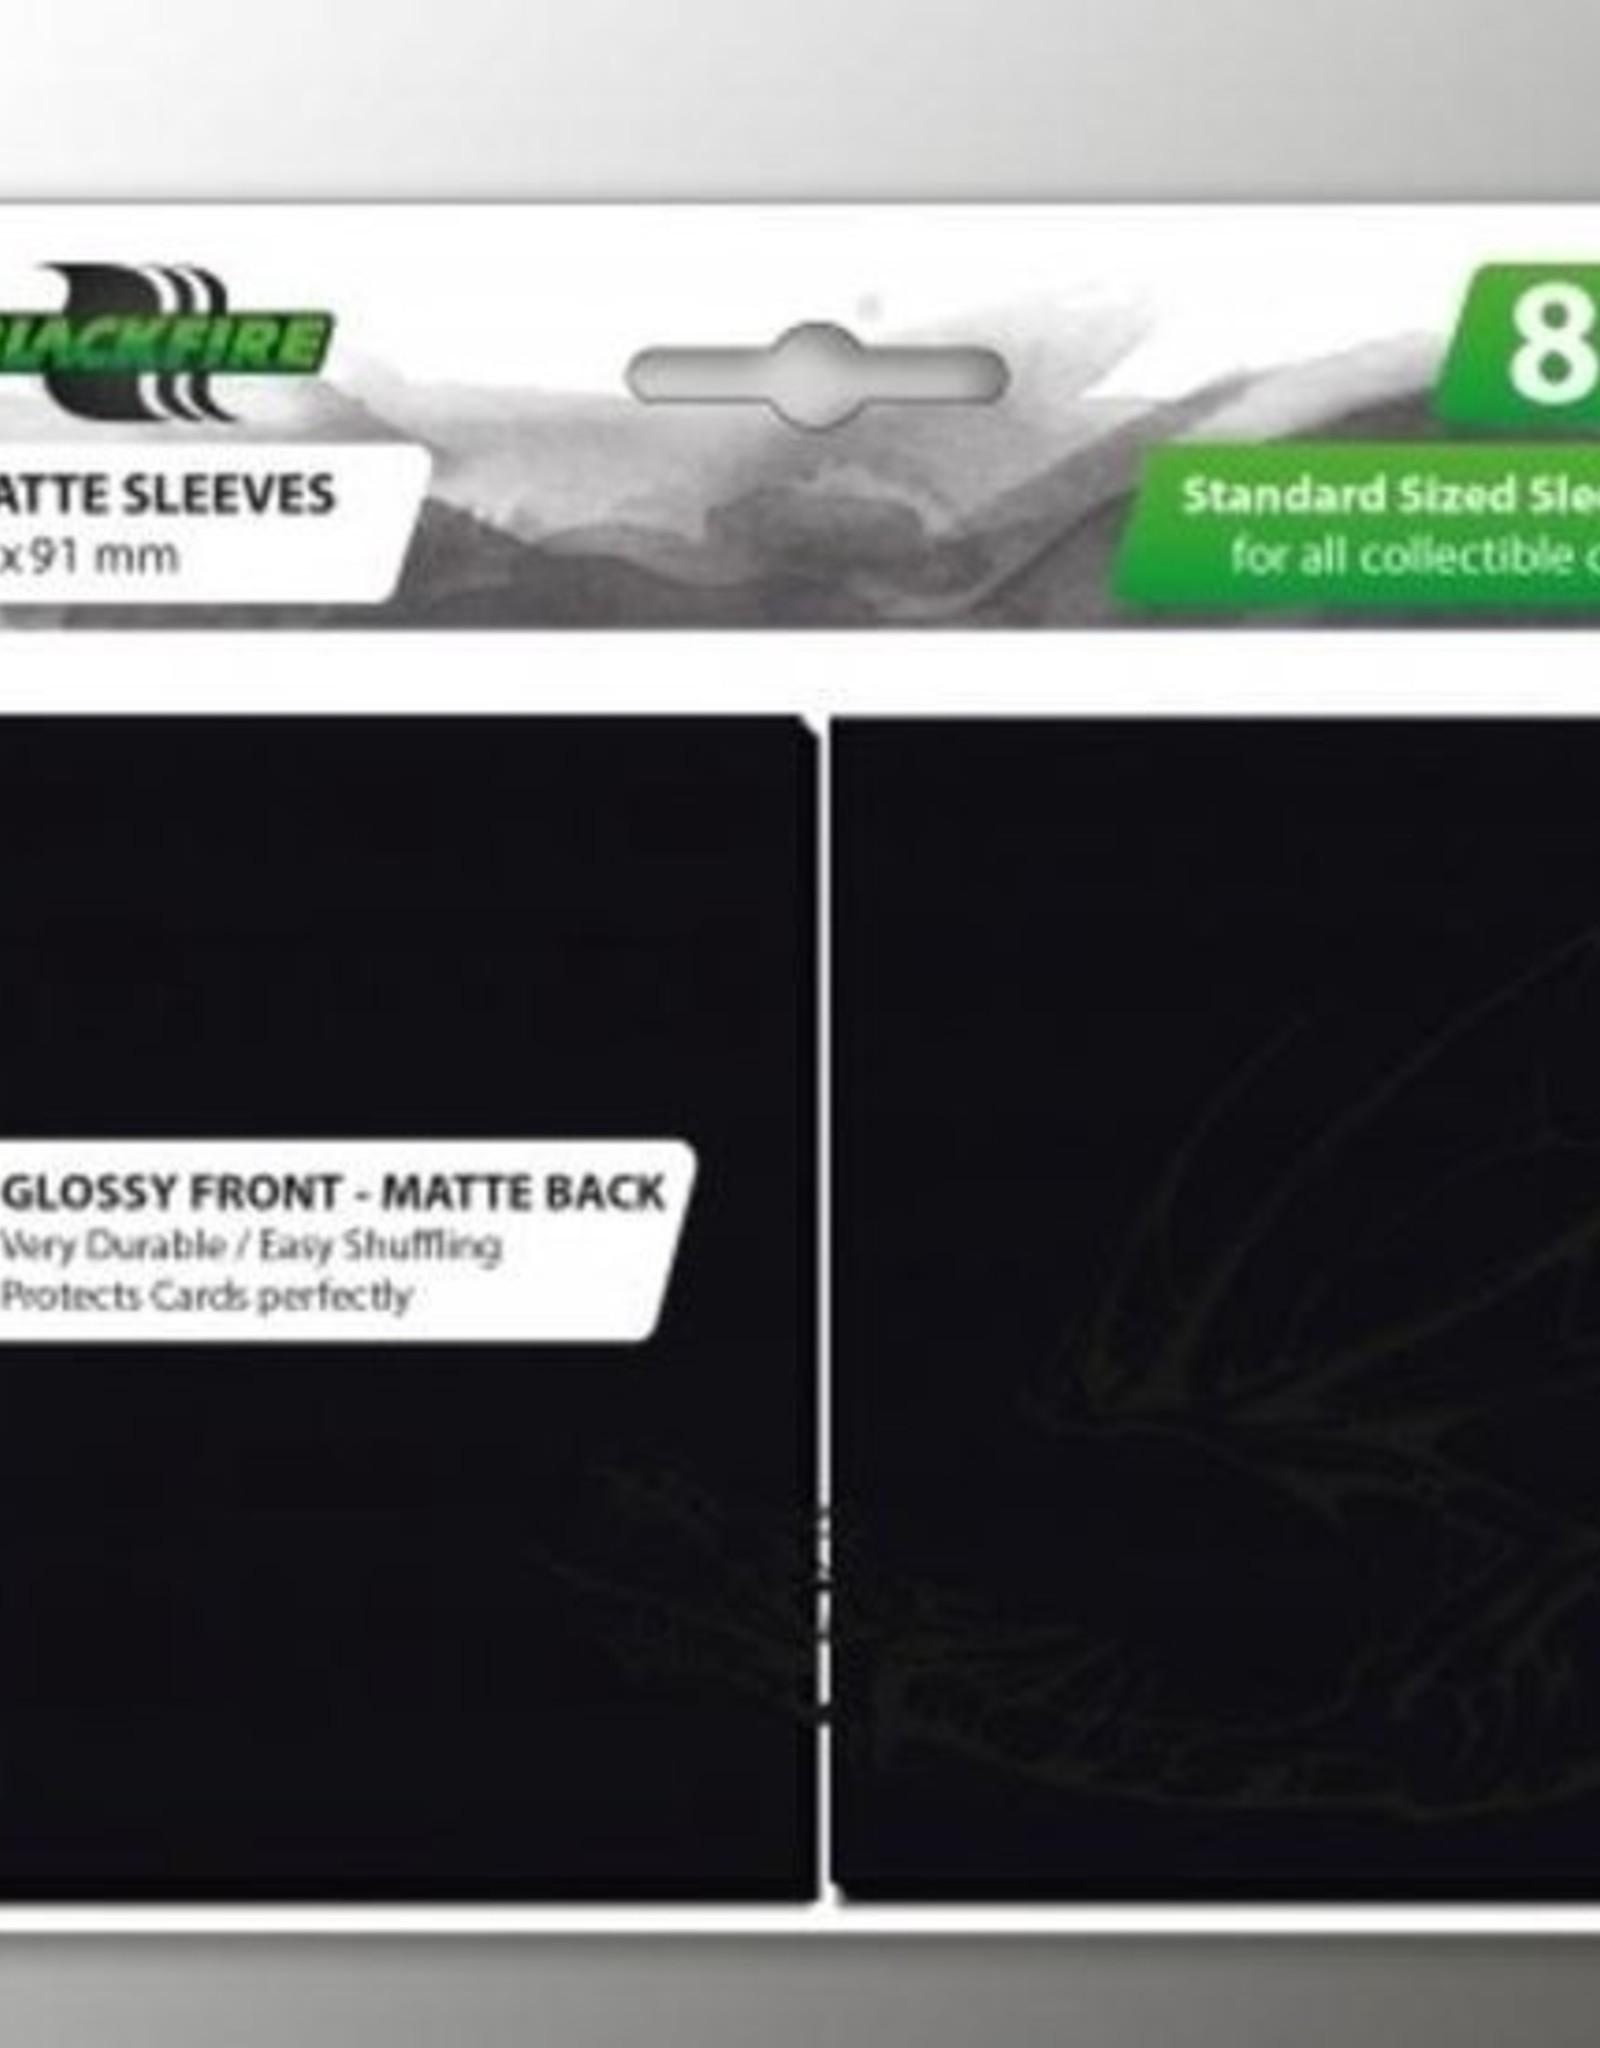 ADC Blackfire Blackfire Sleeves Standard Glossy Front Matte Back Black (80) (66x91mm)